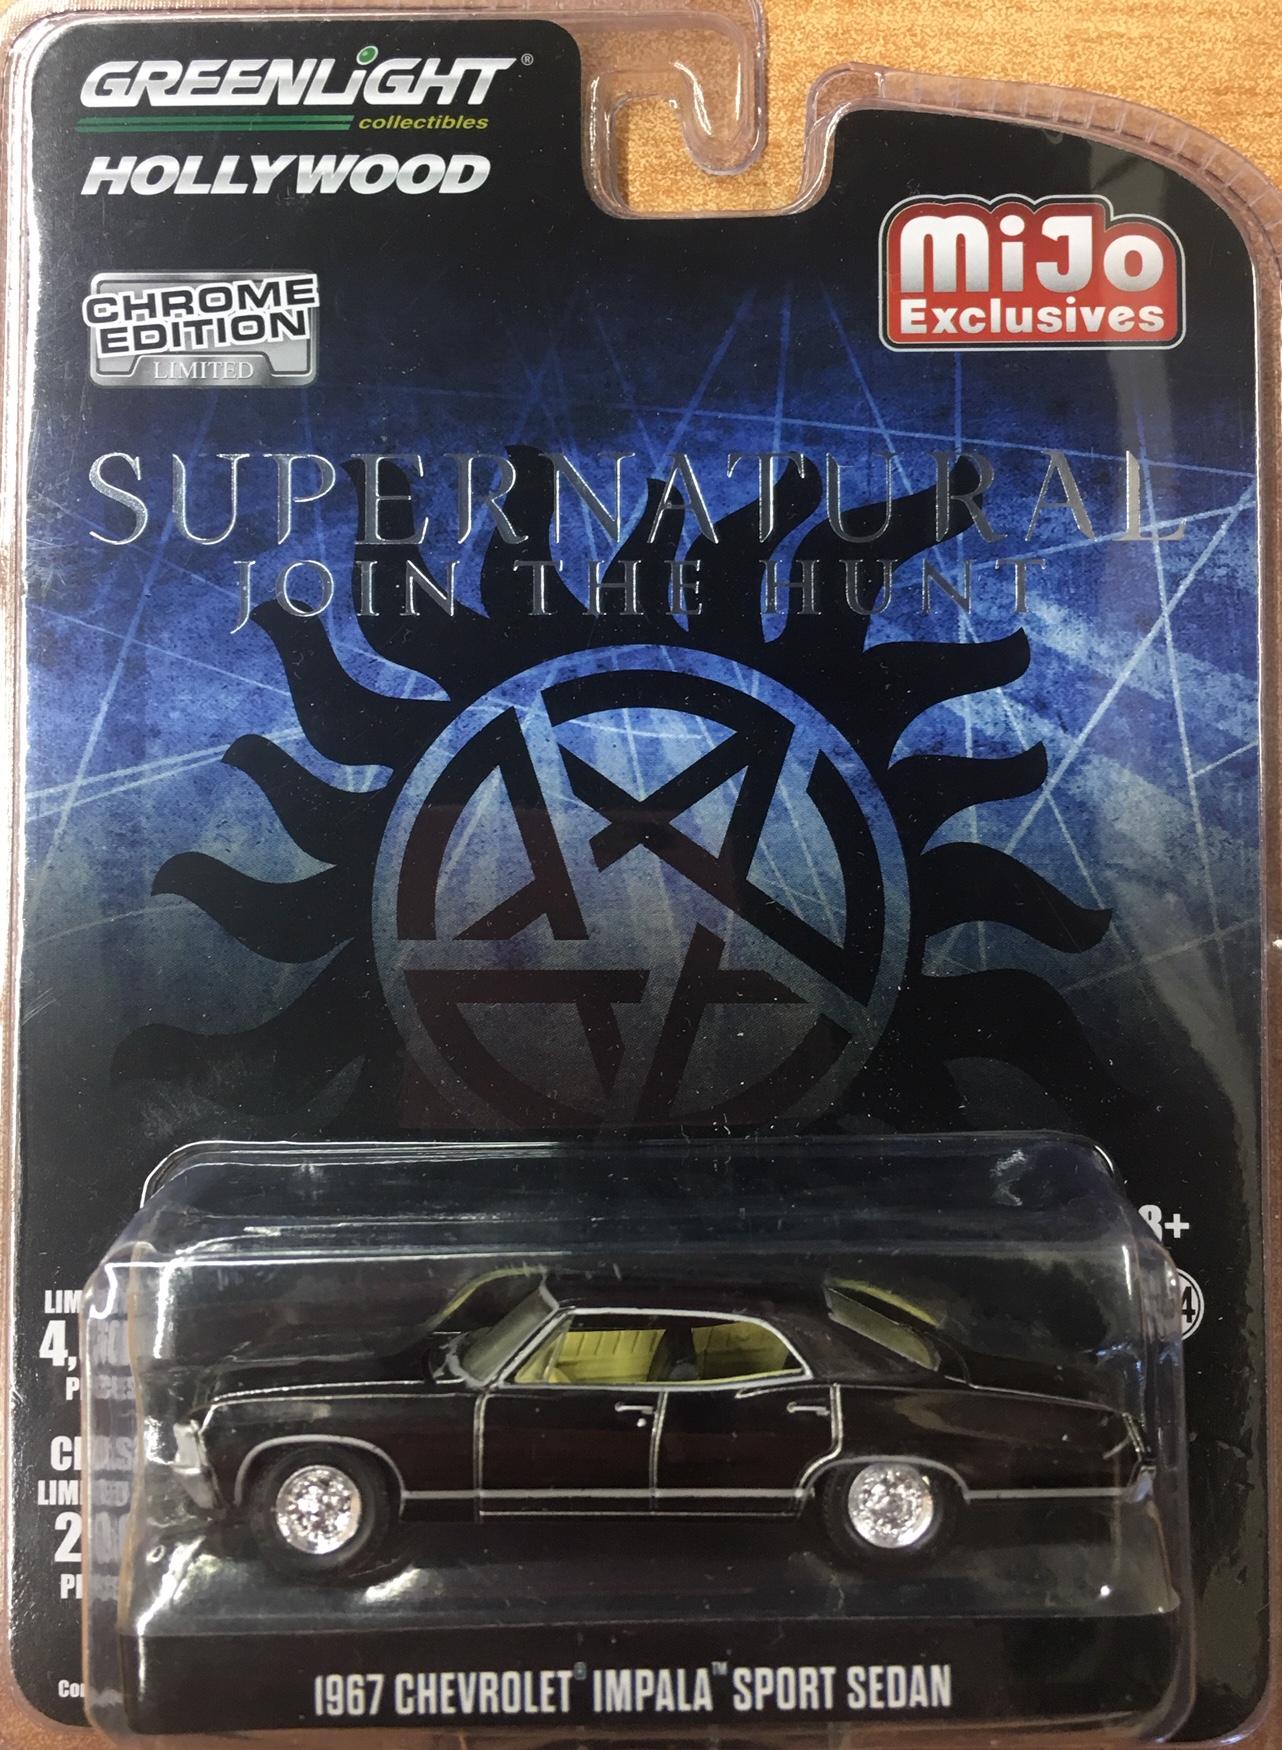 1967 Chevrolet Impala Sport Sedan Supernatural John The Hunt Chrome Edition Diecast Depot